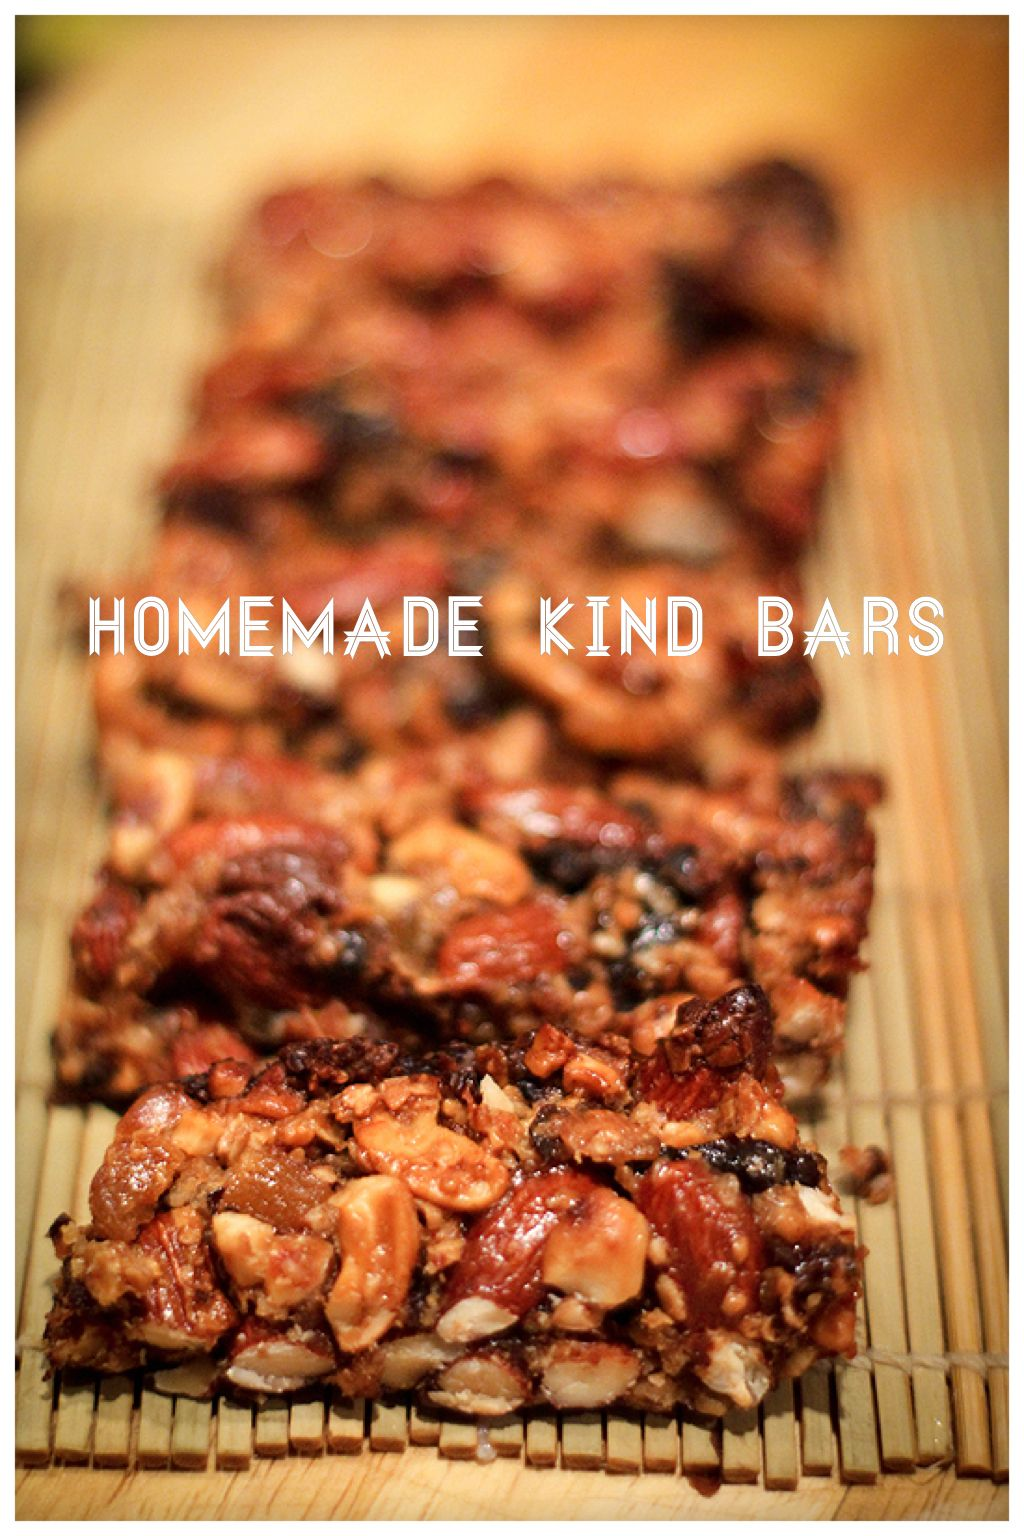 Homemade KIND bars